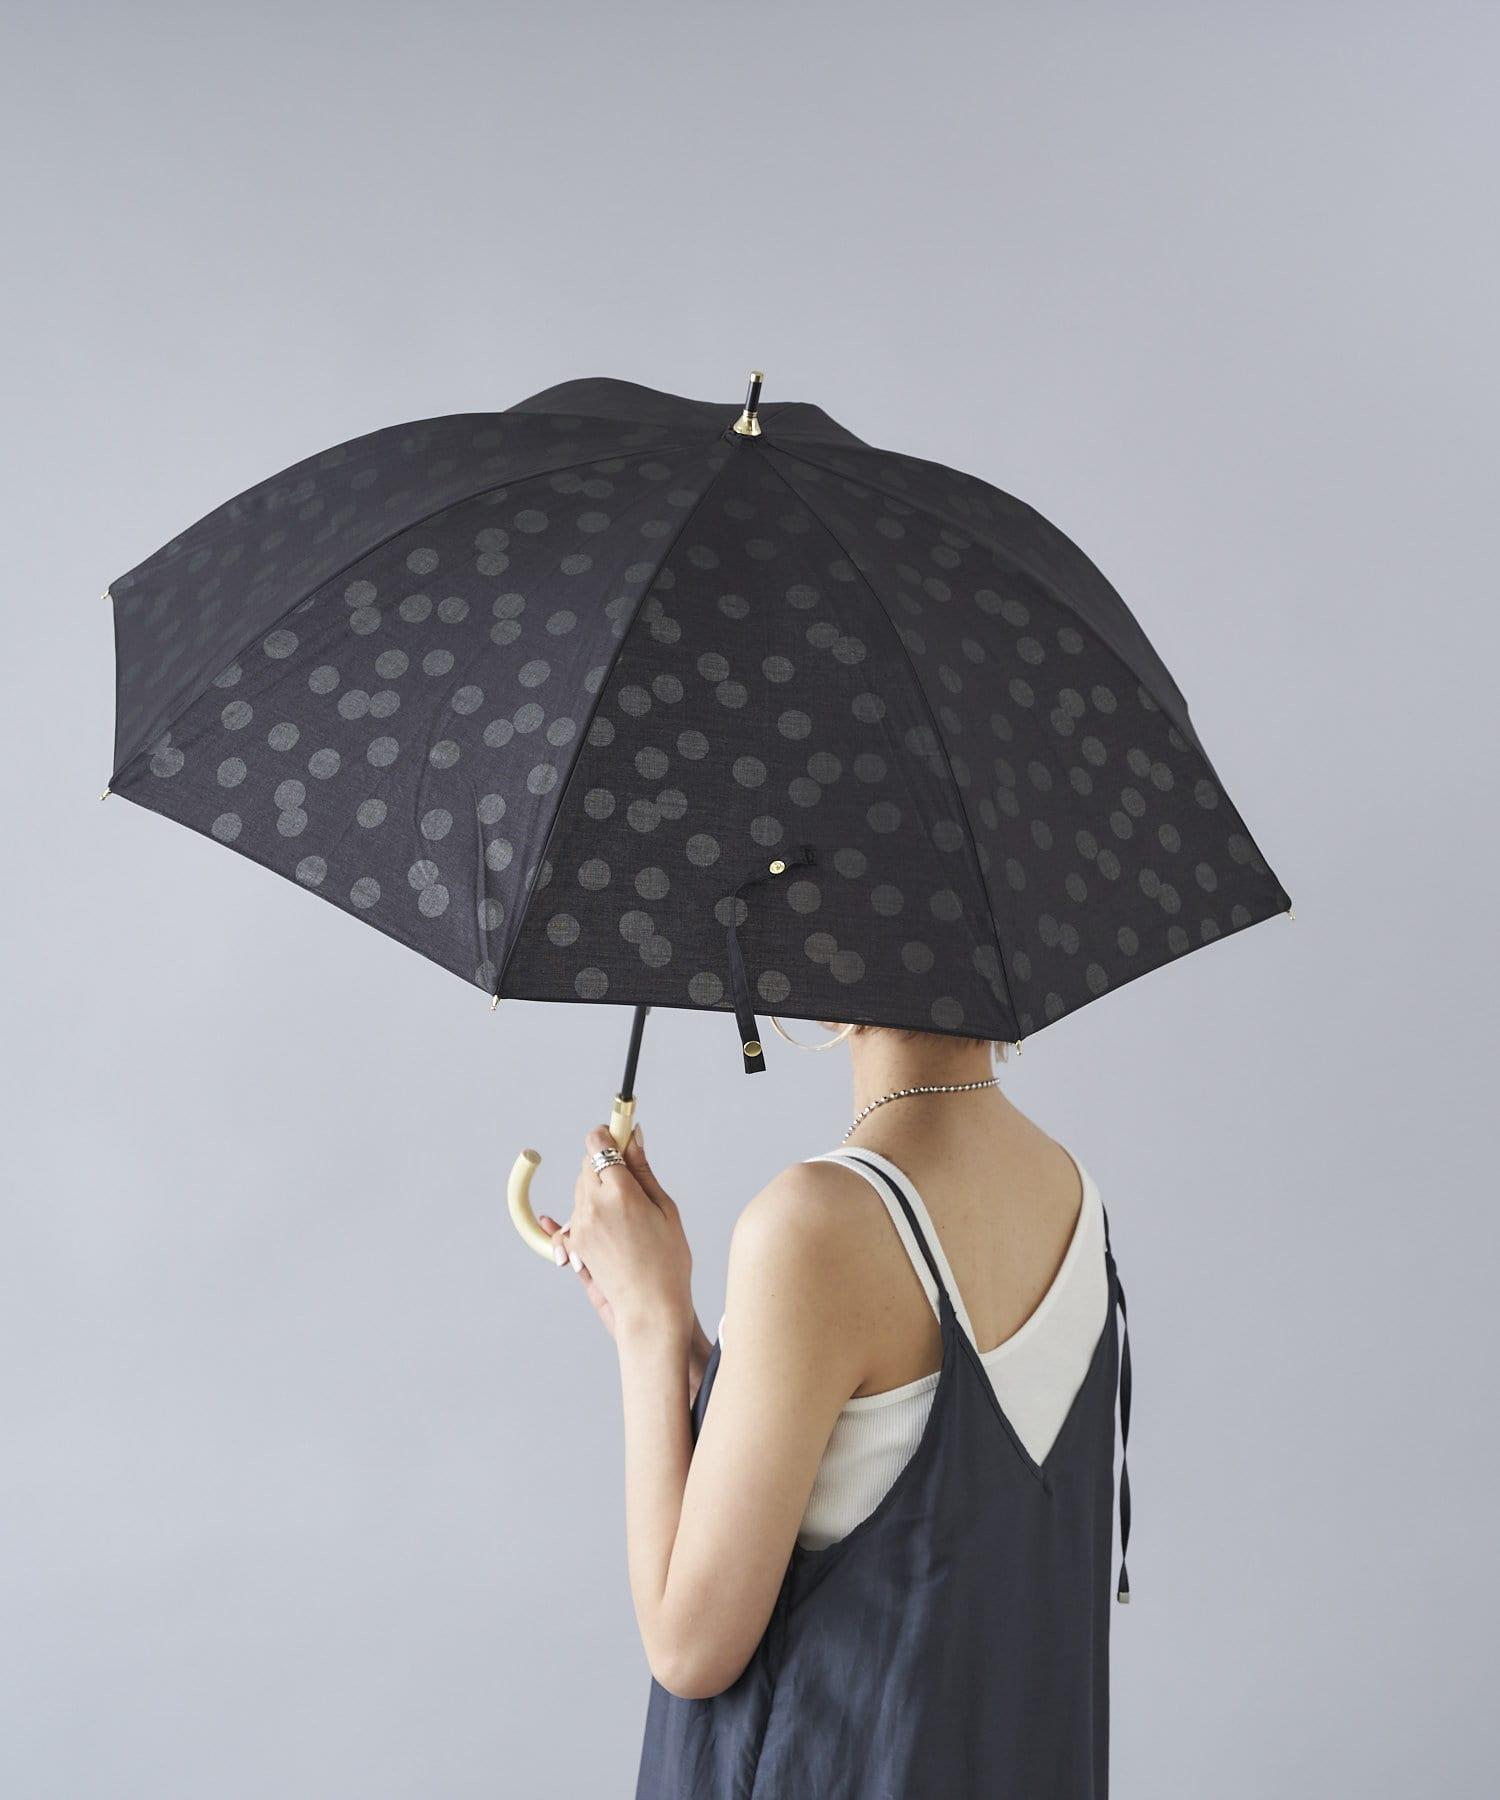 DOUDOU(ドゥドゥ) 【WEB限定】晴雨兼用 オパールドット 傘